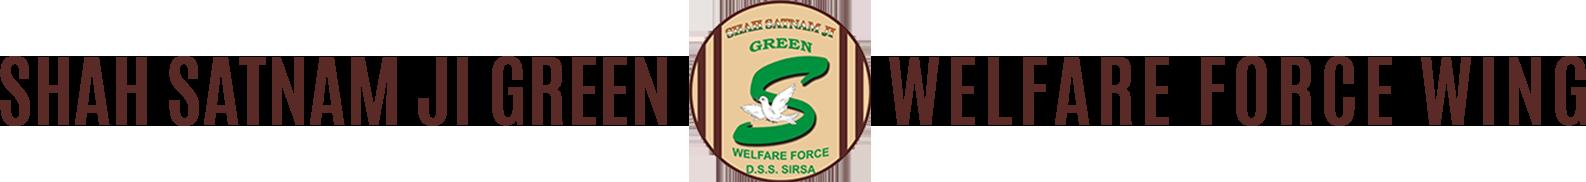 Shah Satnam Ji Green's' Welfare Force Wing